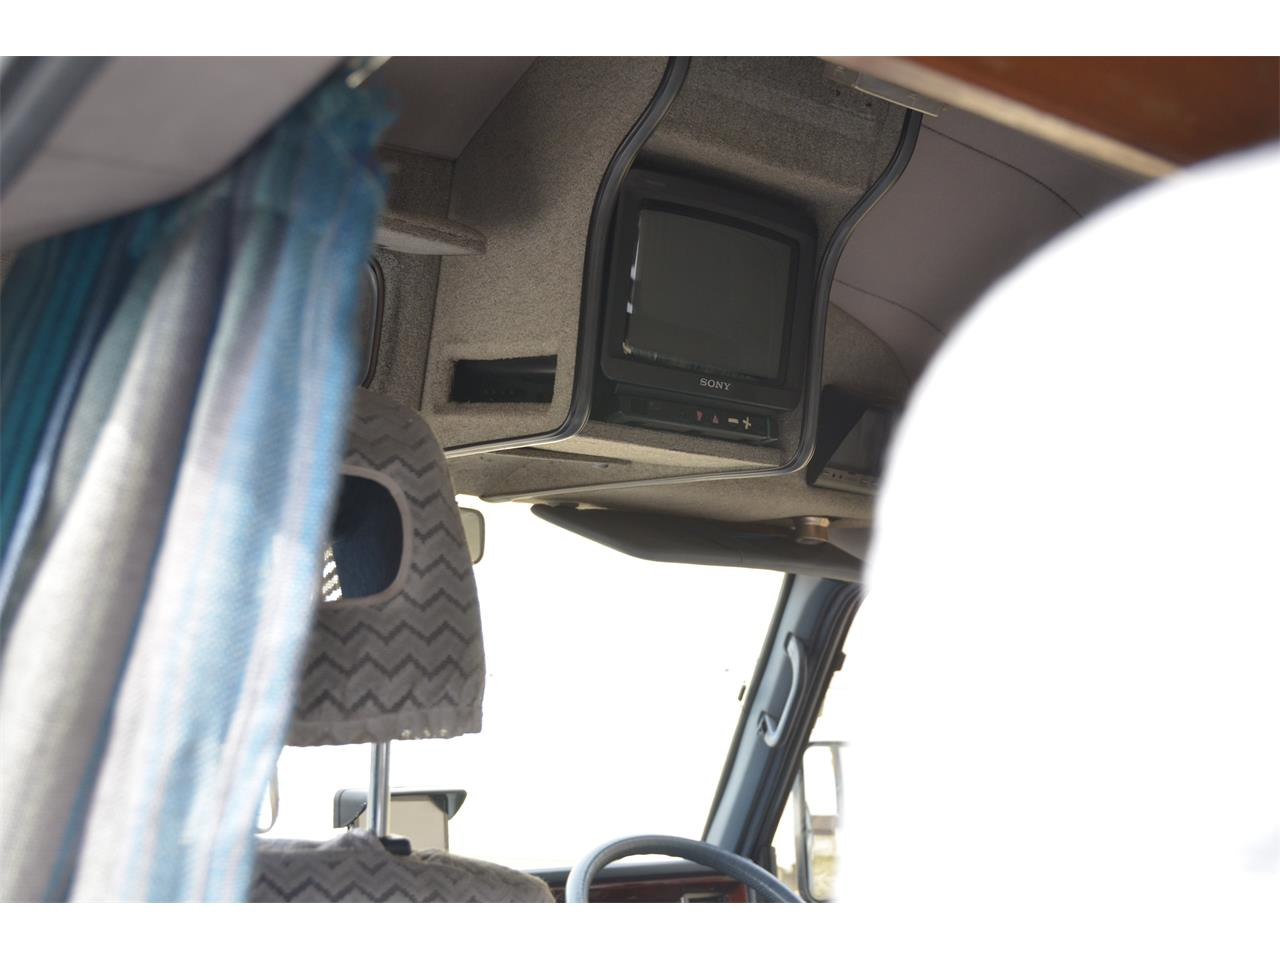 Large Picture of 1990 Caravan - $17,900.00 - LN58